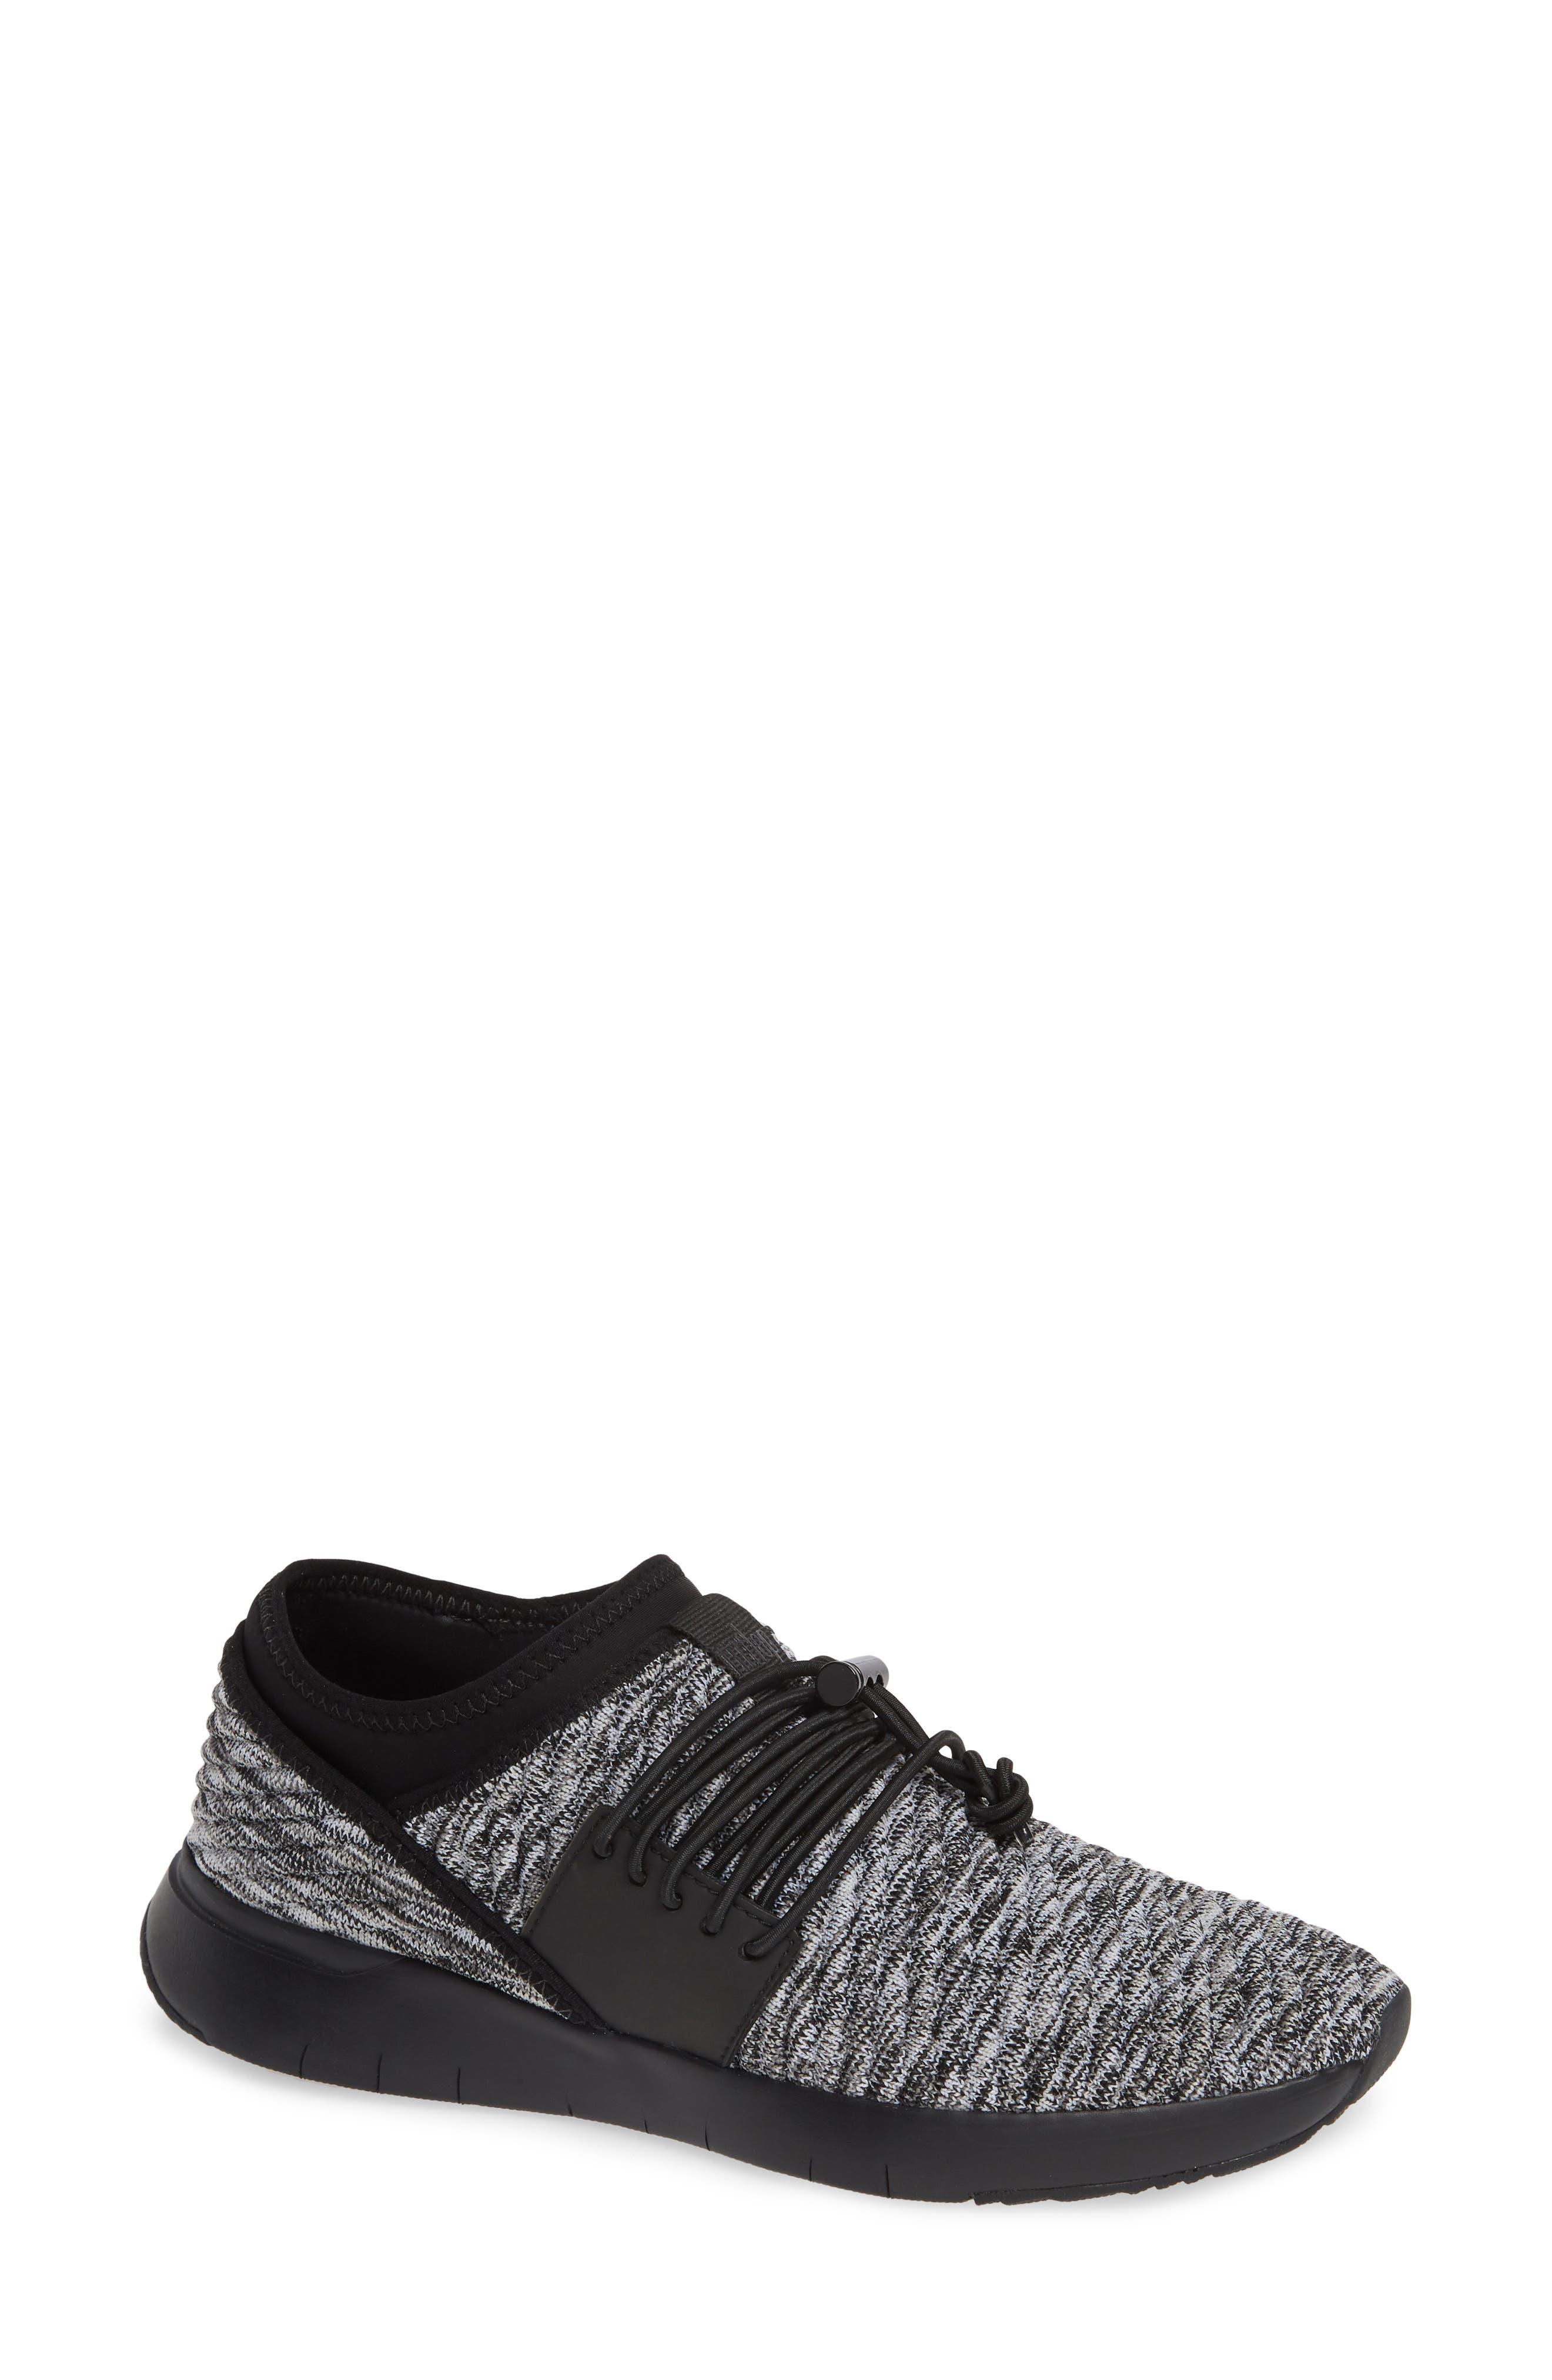 FITFLOP, Artknit Sock Sneaker, Main thumbnail 1, color, 017